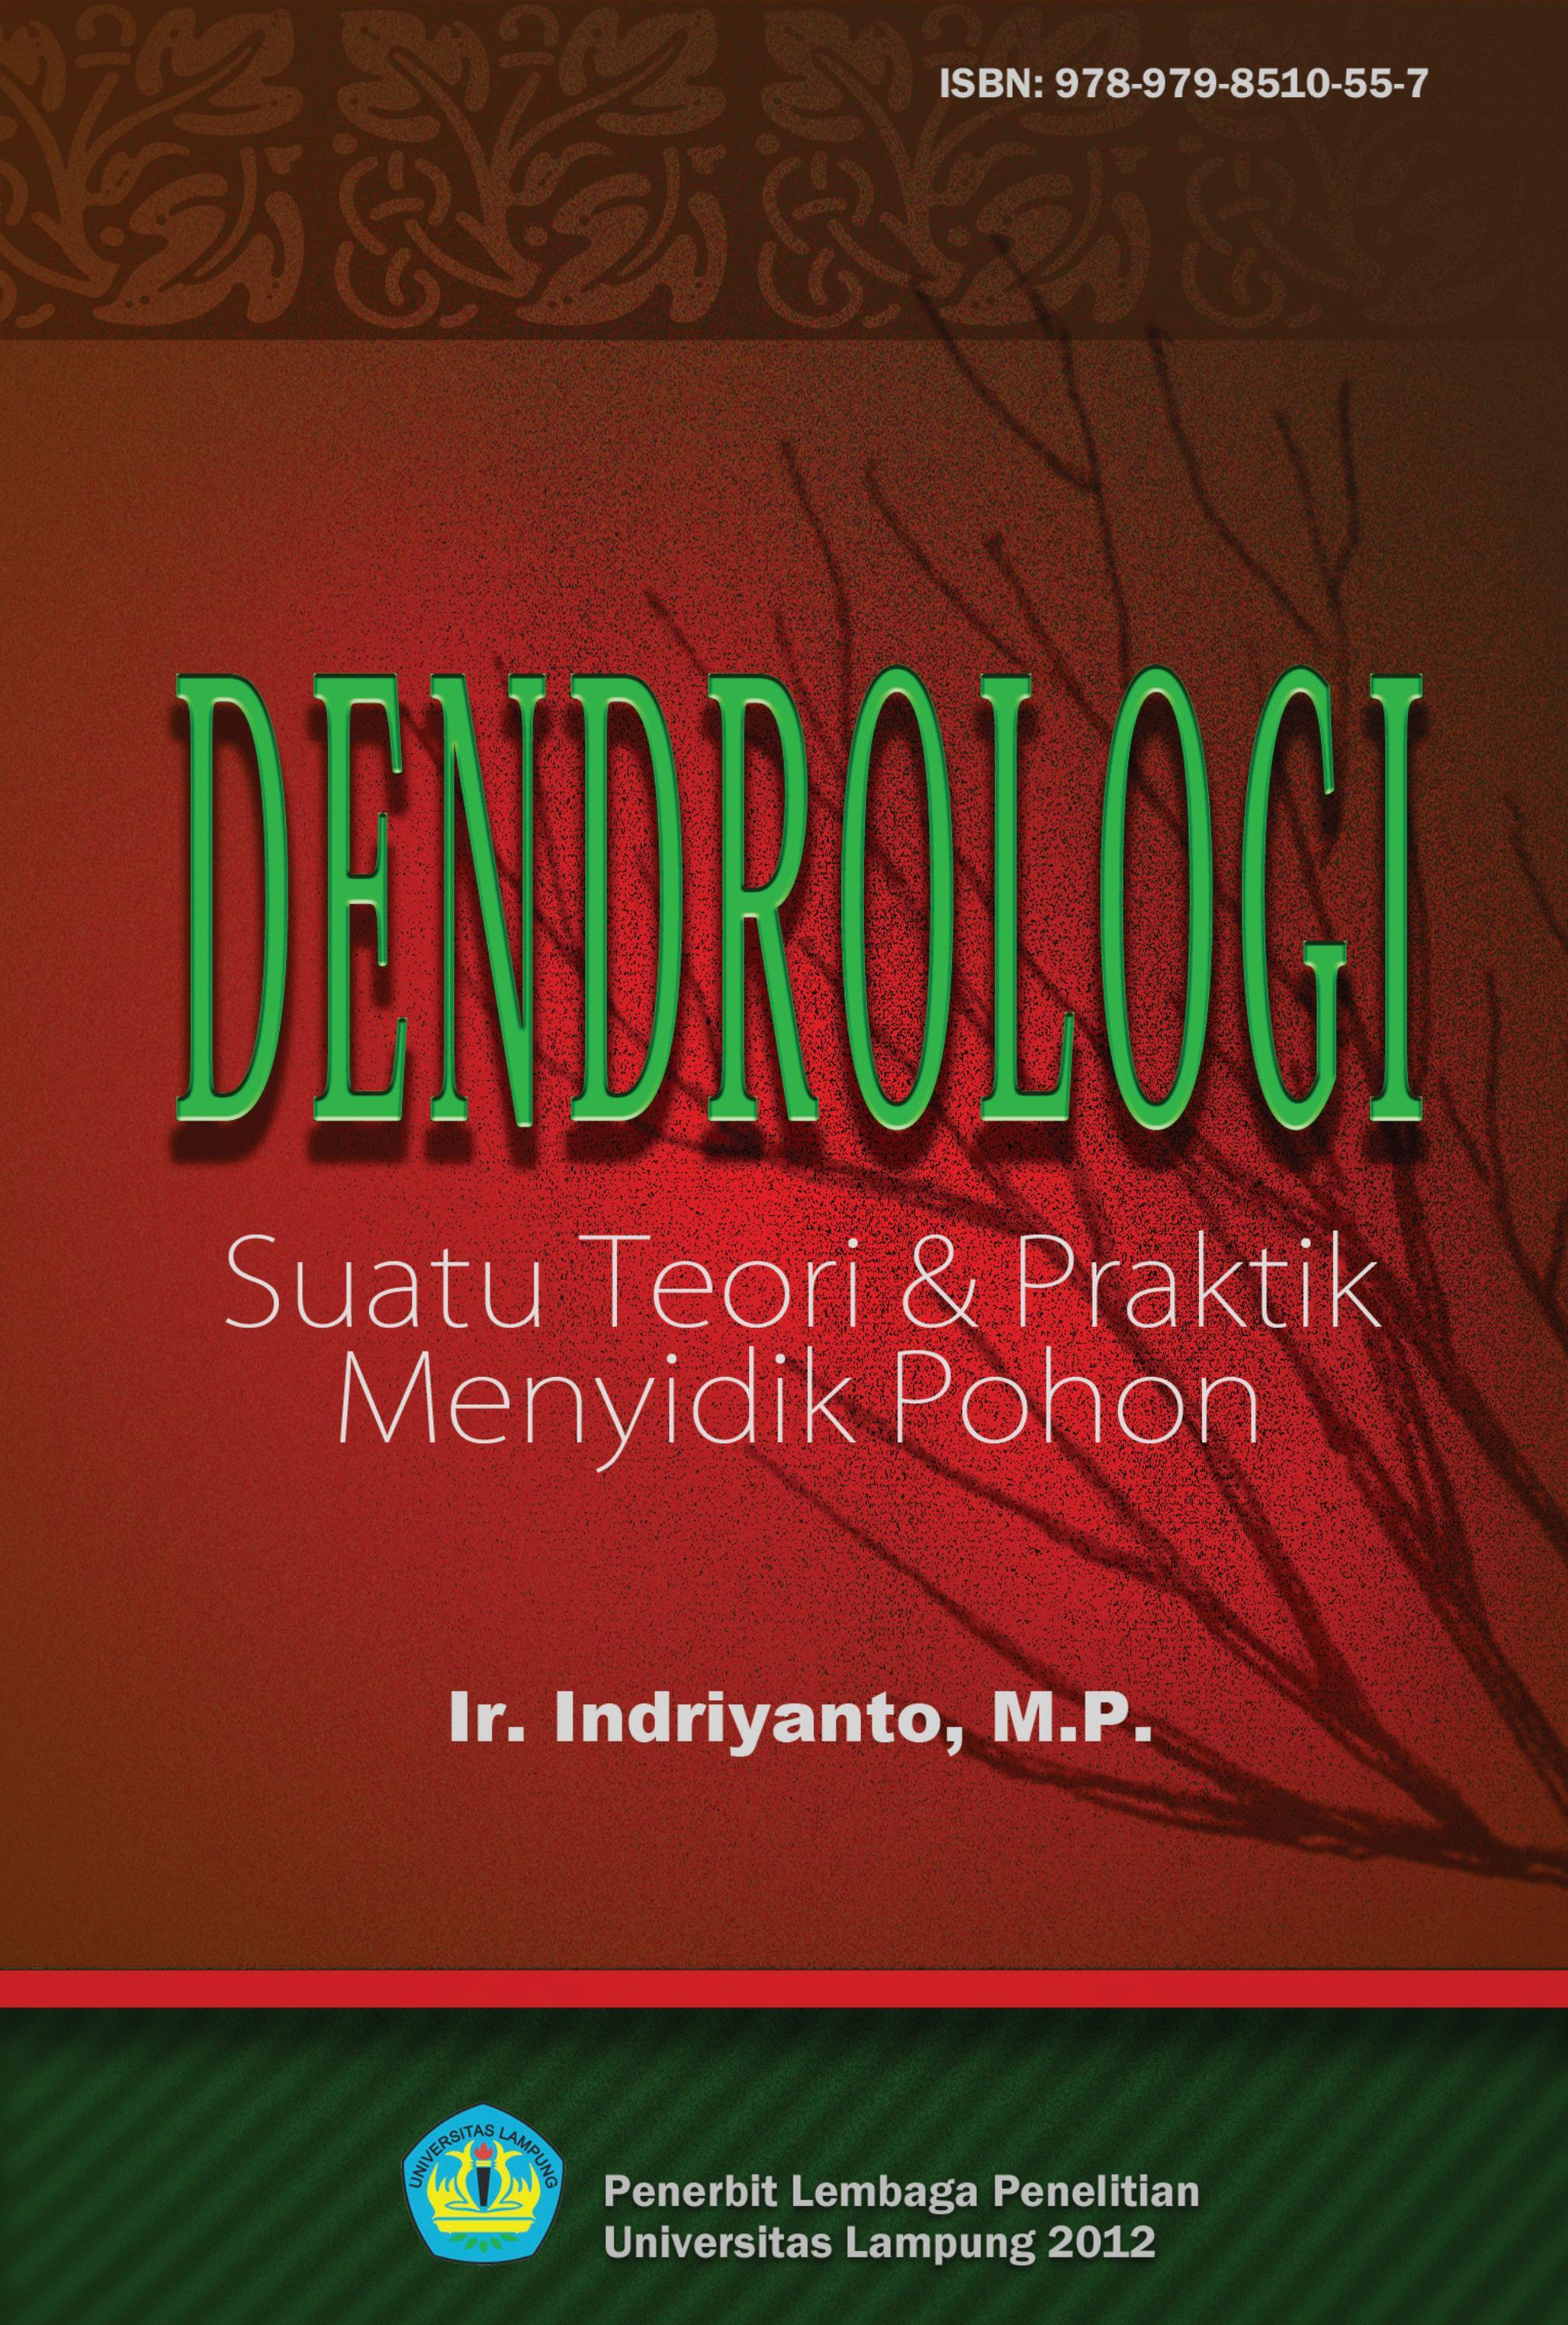 Dendrologi Suatu Teori Praktik Menyidik Pohon Indriyanto By Aprohan Saputra Issuu